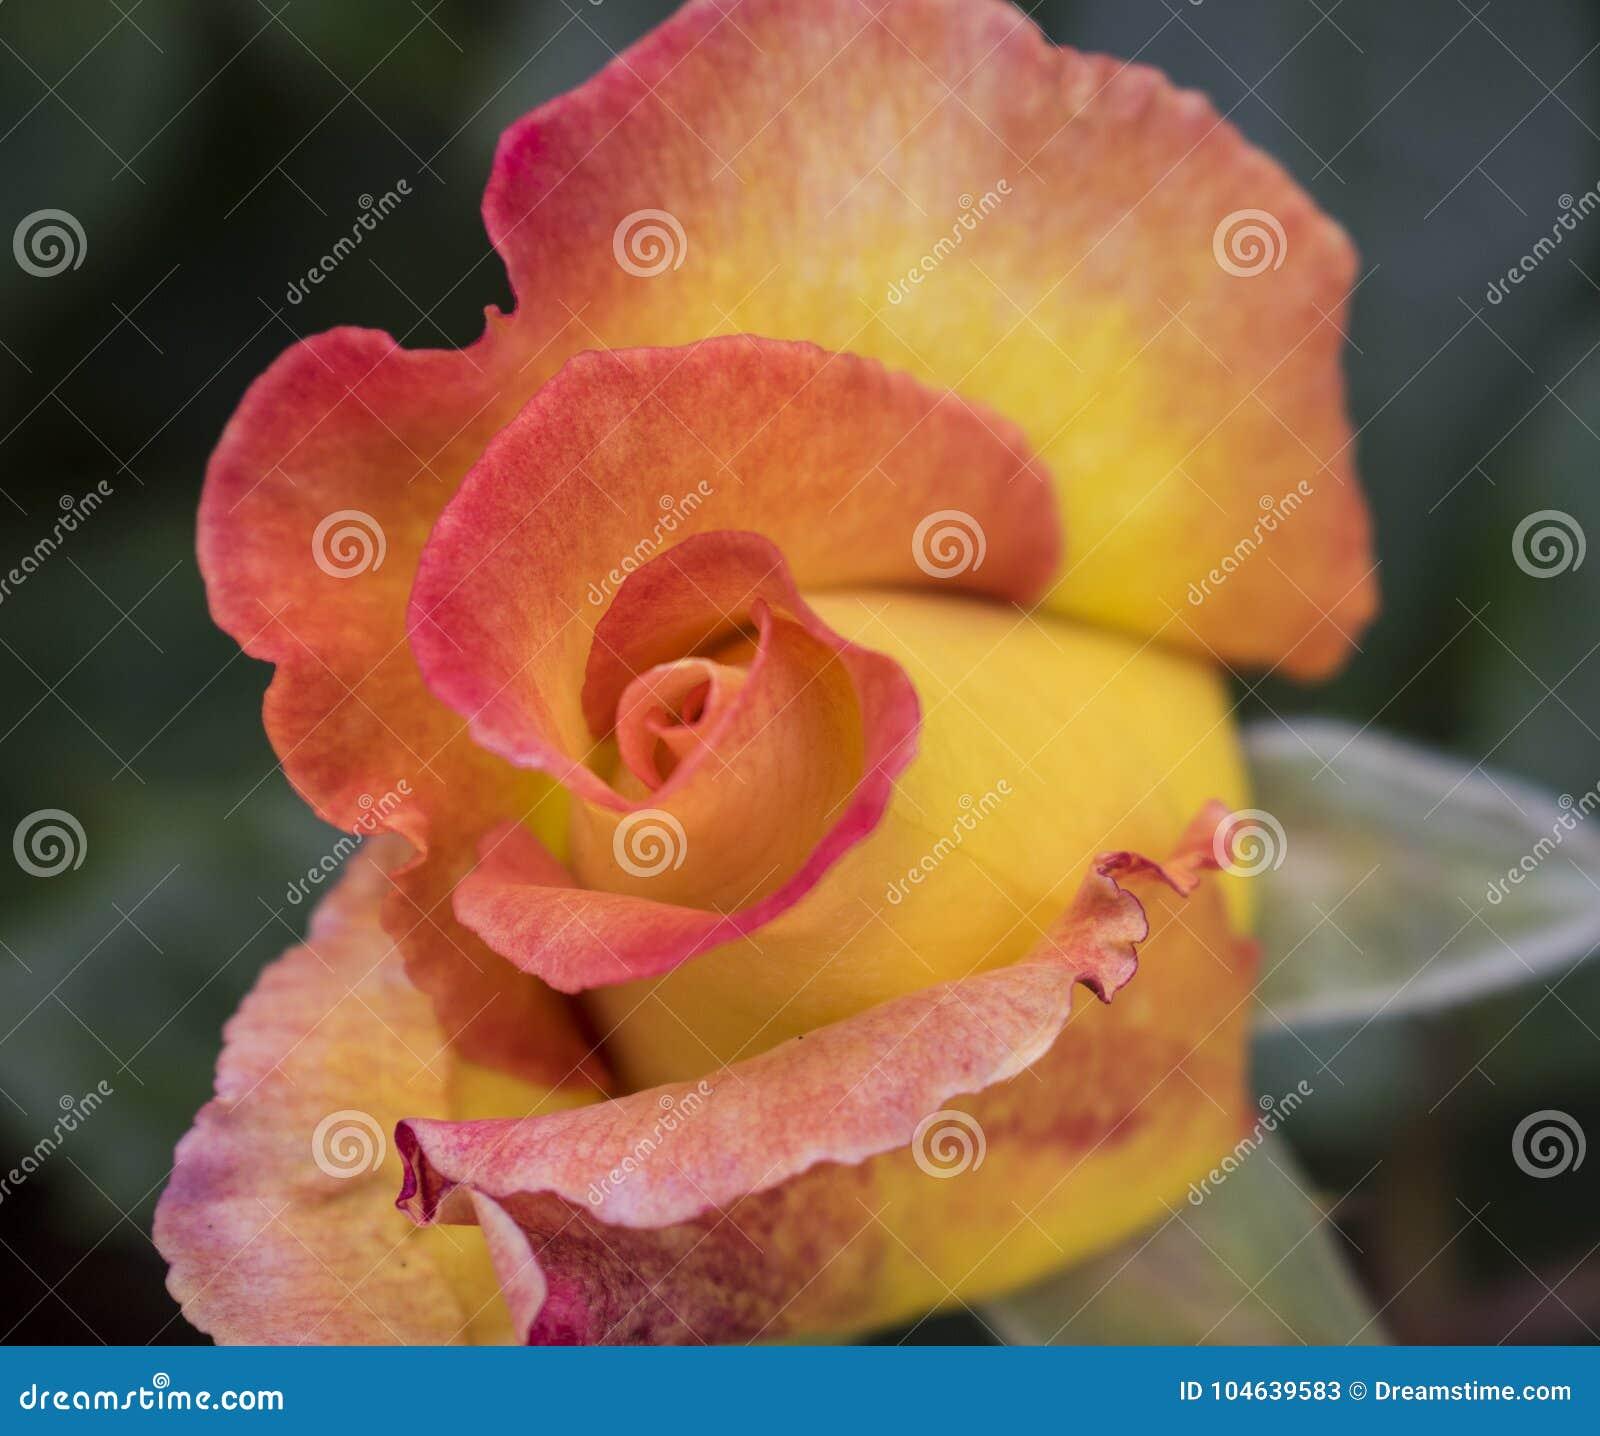 Download Mooie Rood En Geel Nam Te Openen Knop Enkel Ongeveer Toe Stock Afbeelding - Afbeelding bestaande uit beeld, mooi: 104639583